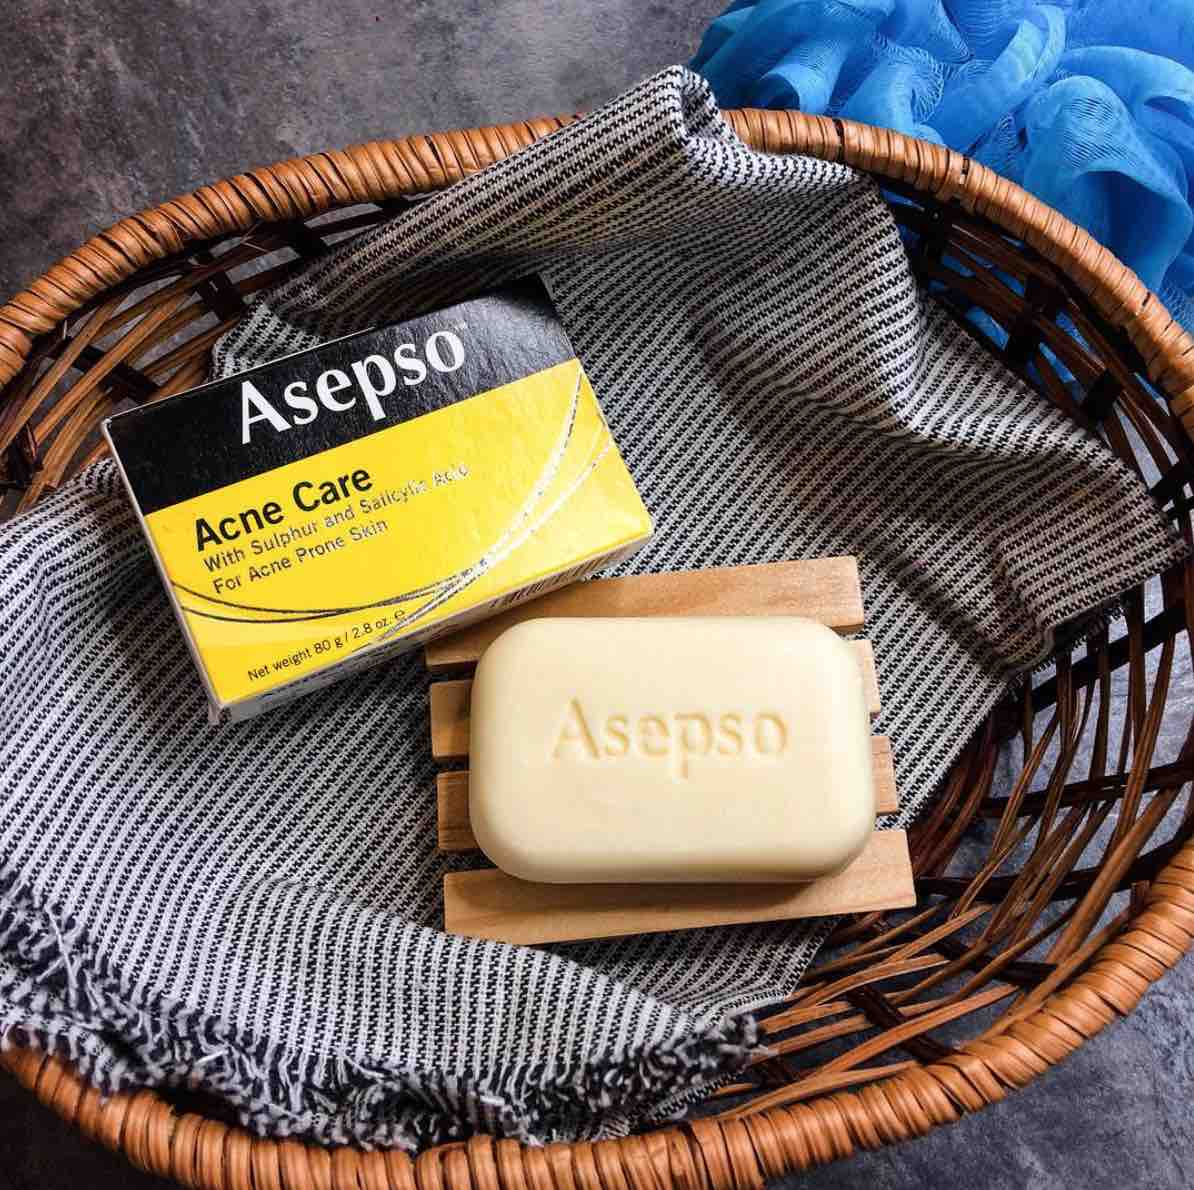 ASEPSO ACNE CARE BAR SOAP